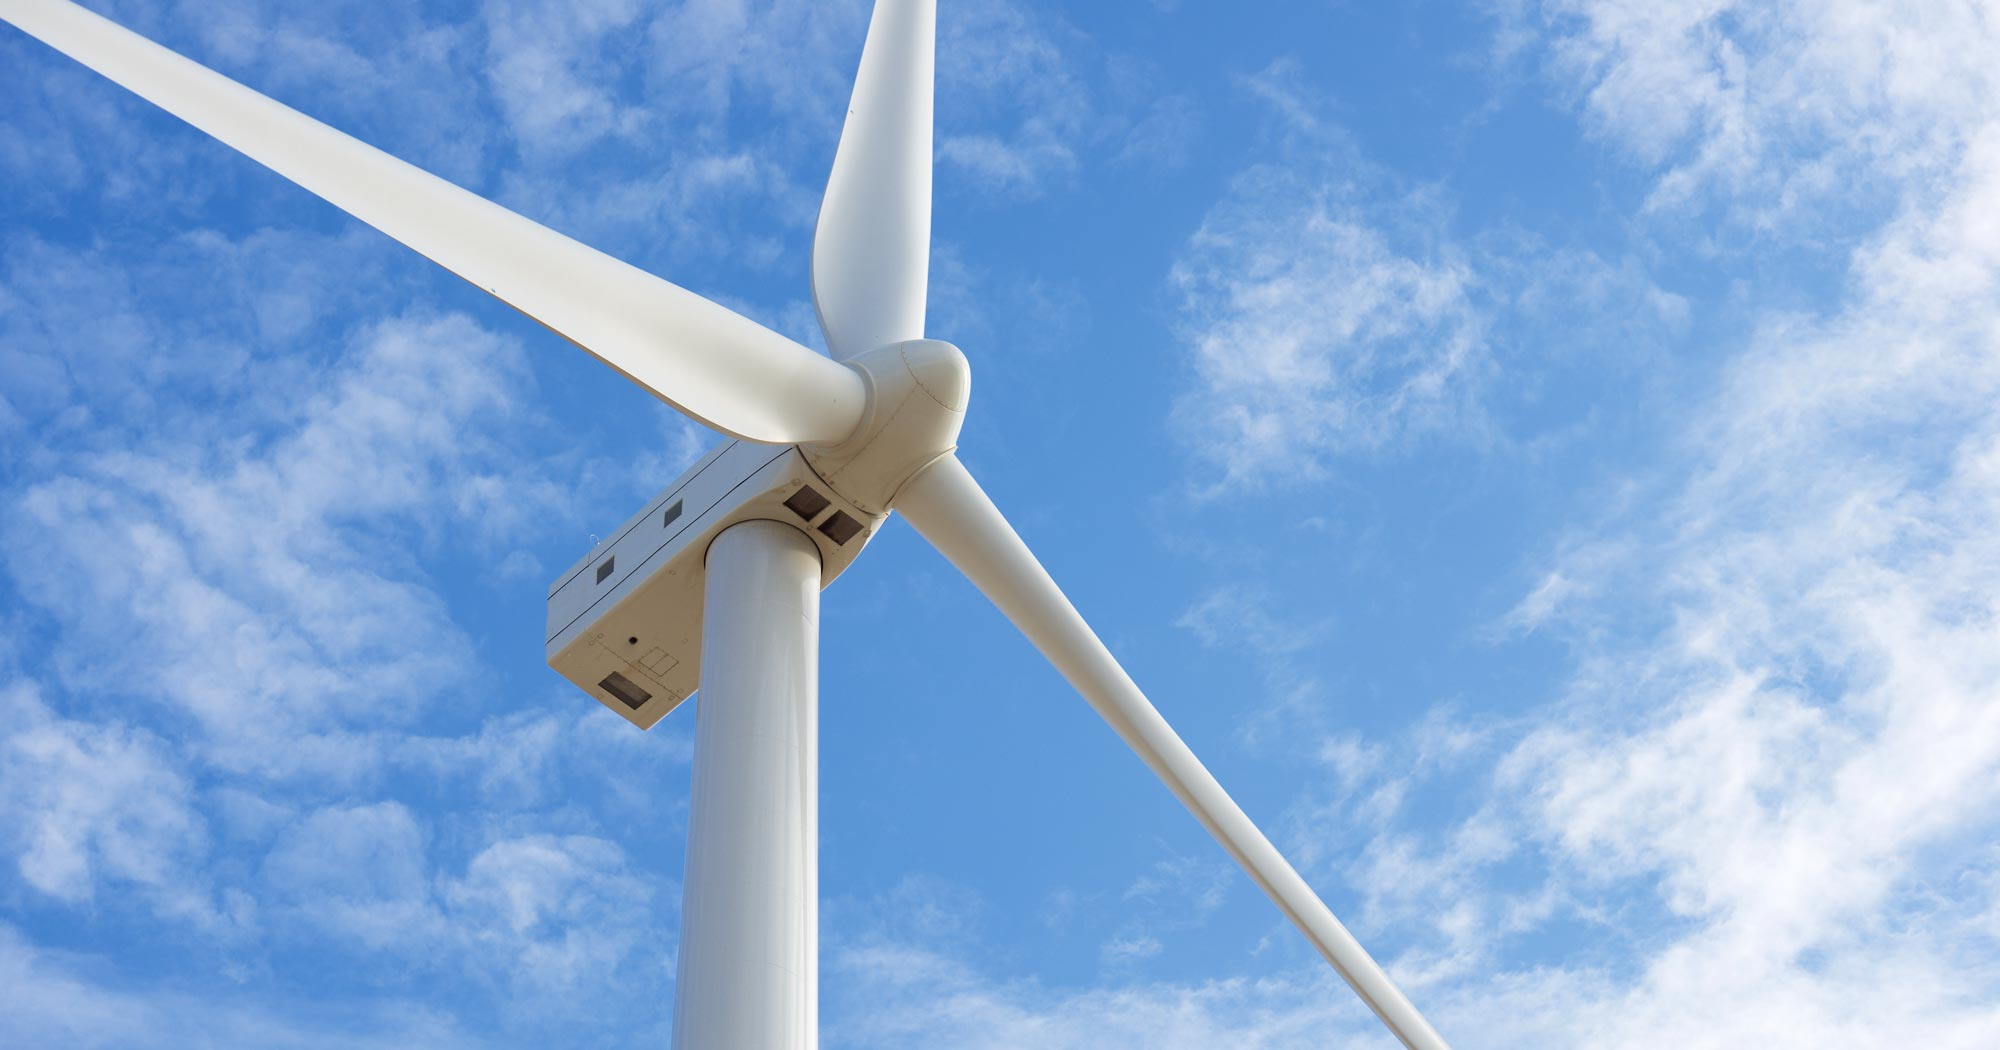 Close-up on a wind turbine